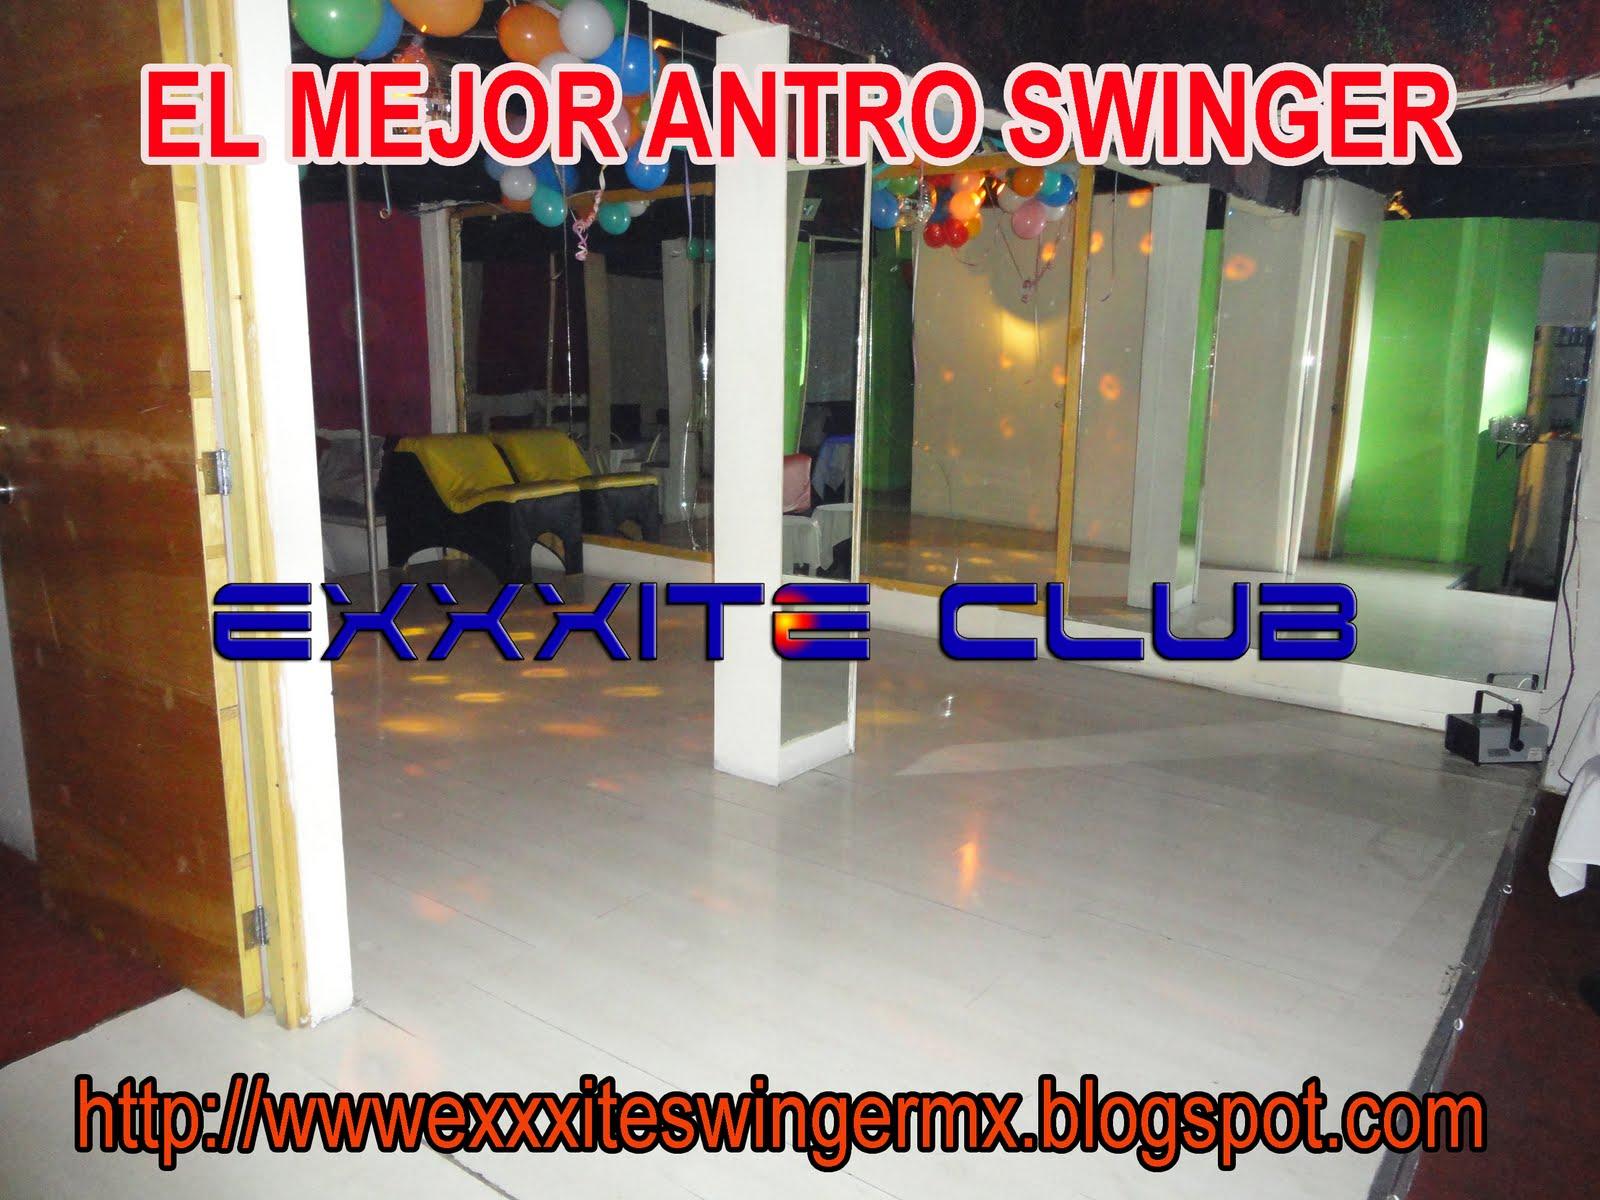 EL MEJOR ANTRO SWINGER EXXXITE